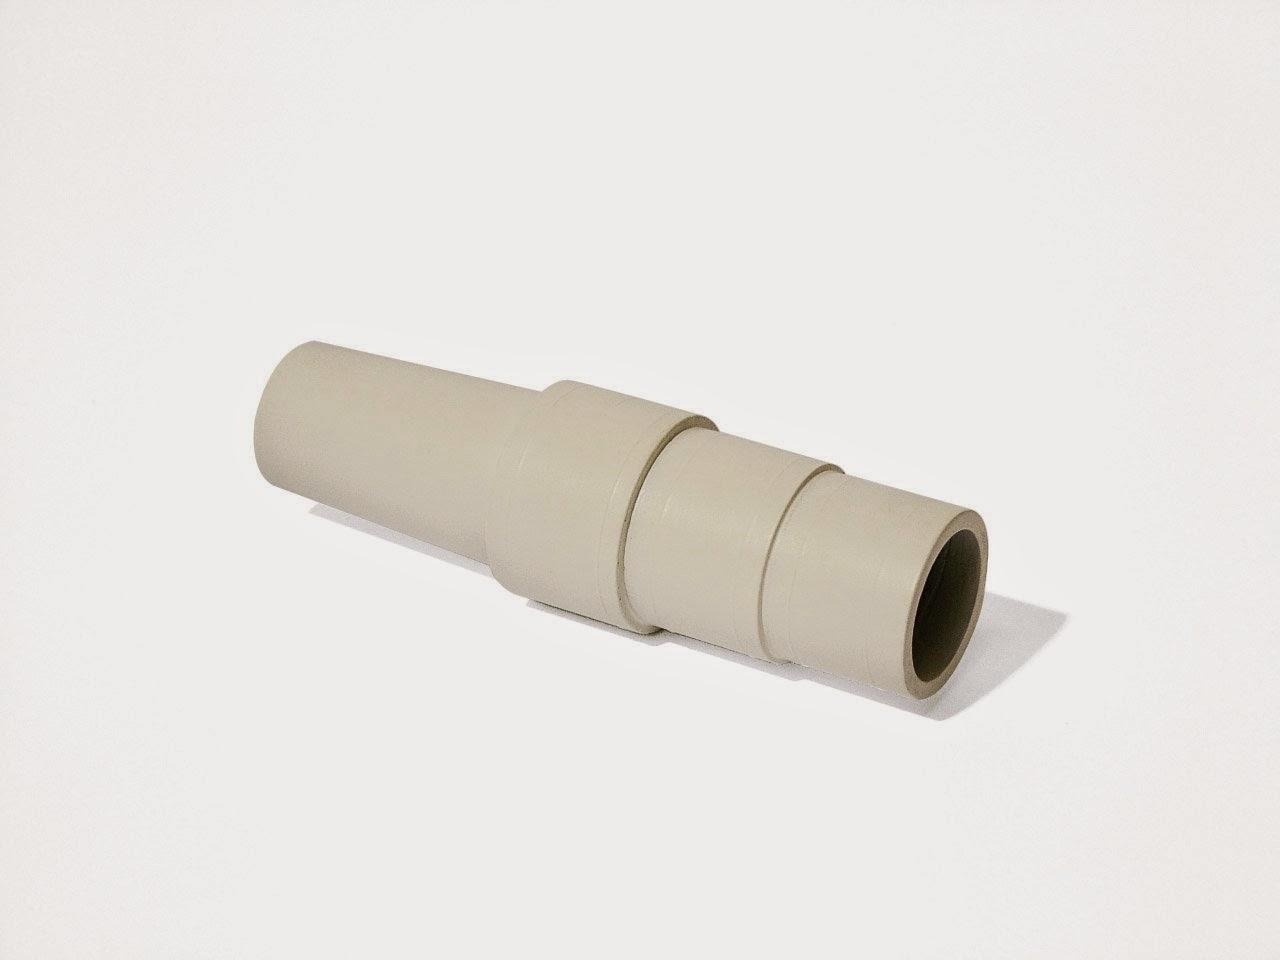 pool vacuum hose: pool vacuum hose adapter